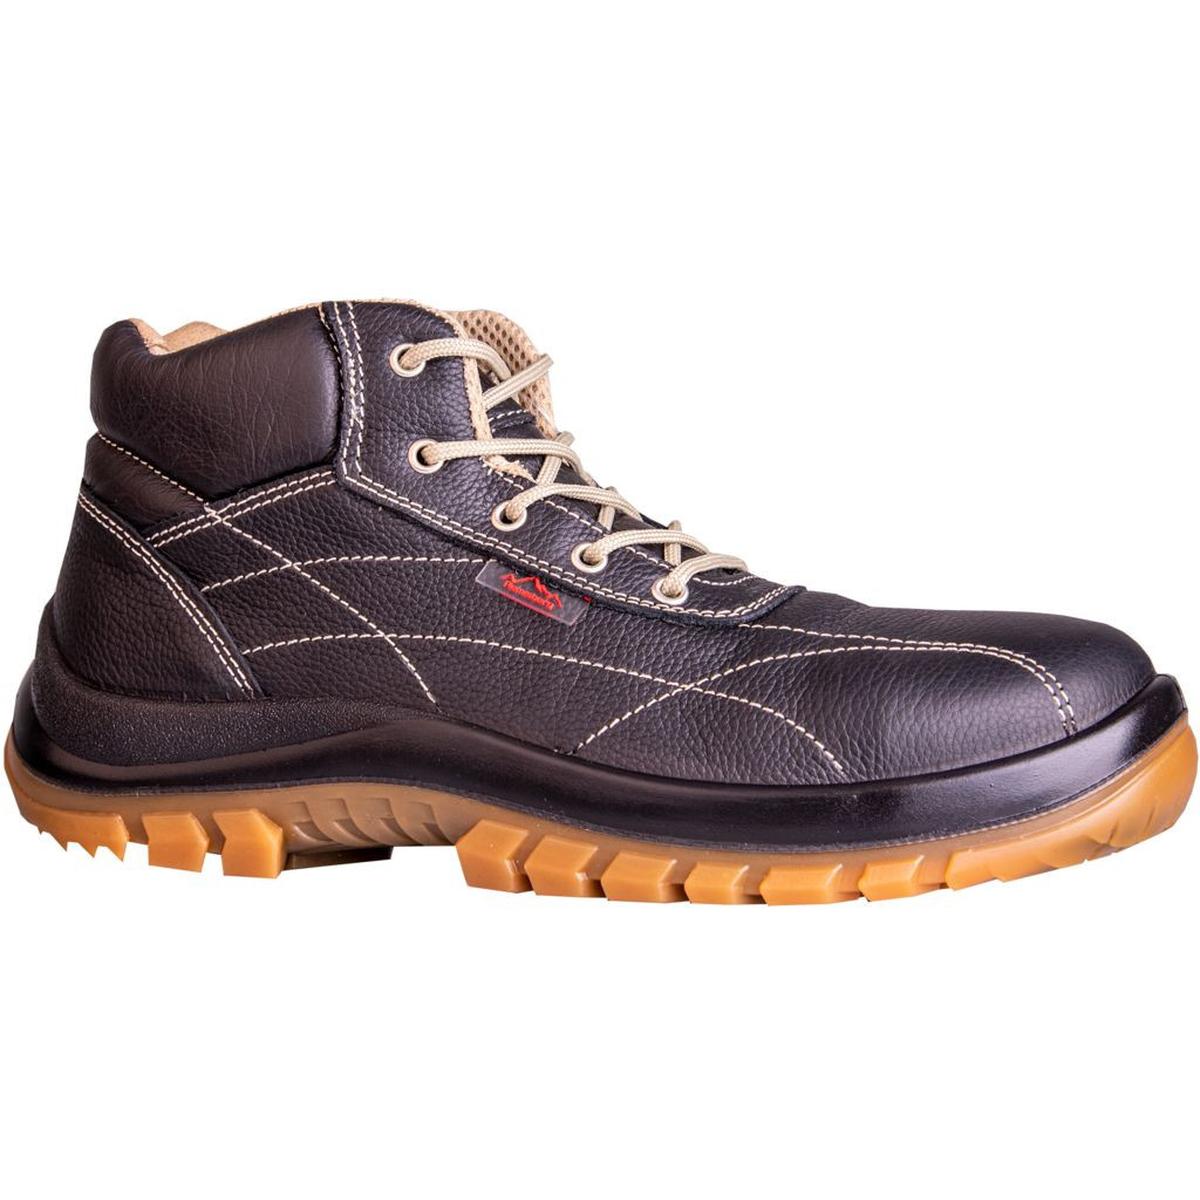 TOP Slipper Halb zapatos  Damen zapatos  Slipper TOP Stretch 4939 Grün 40 ec20b7